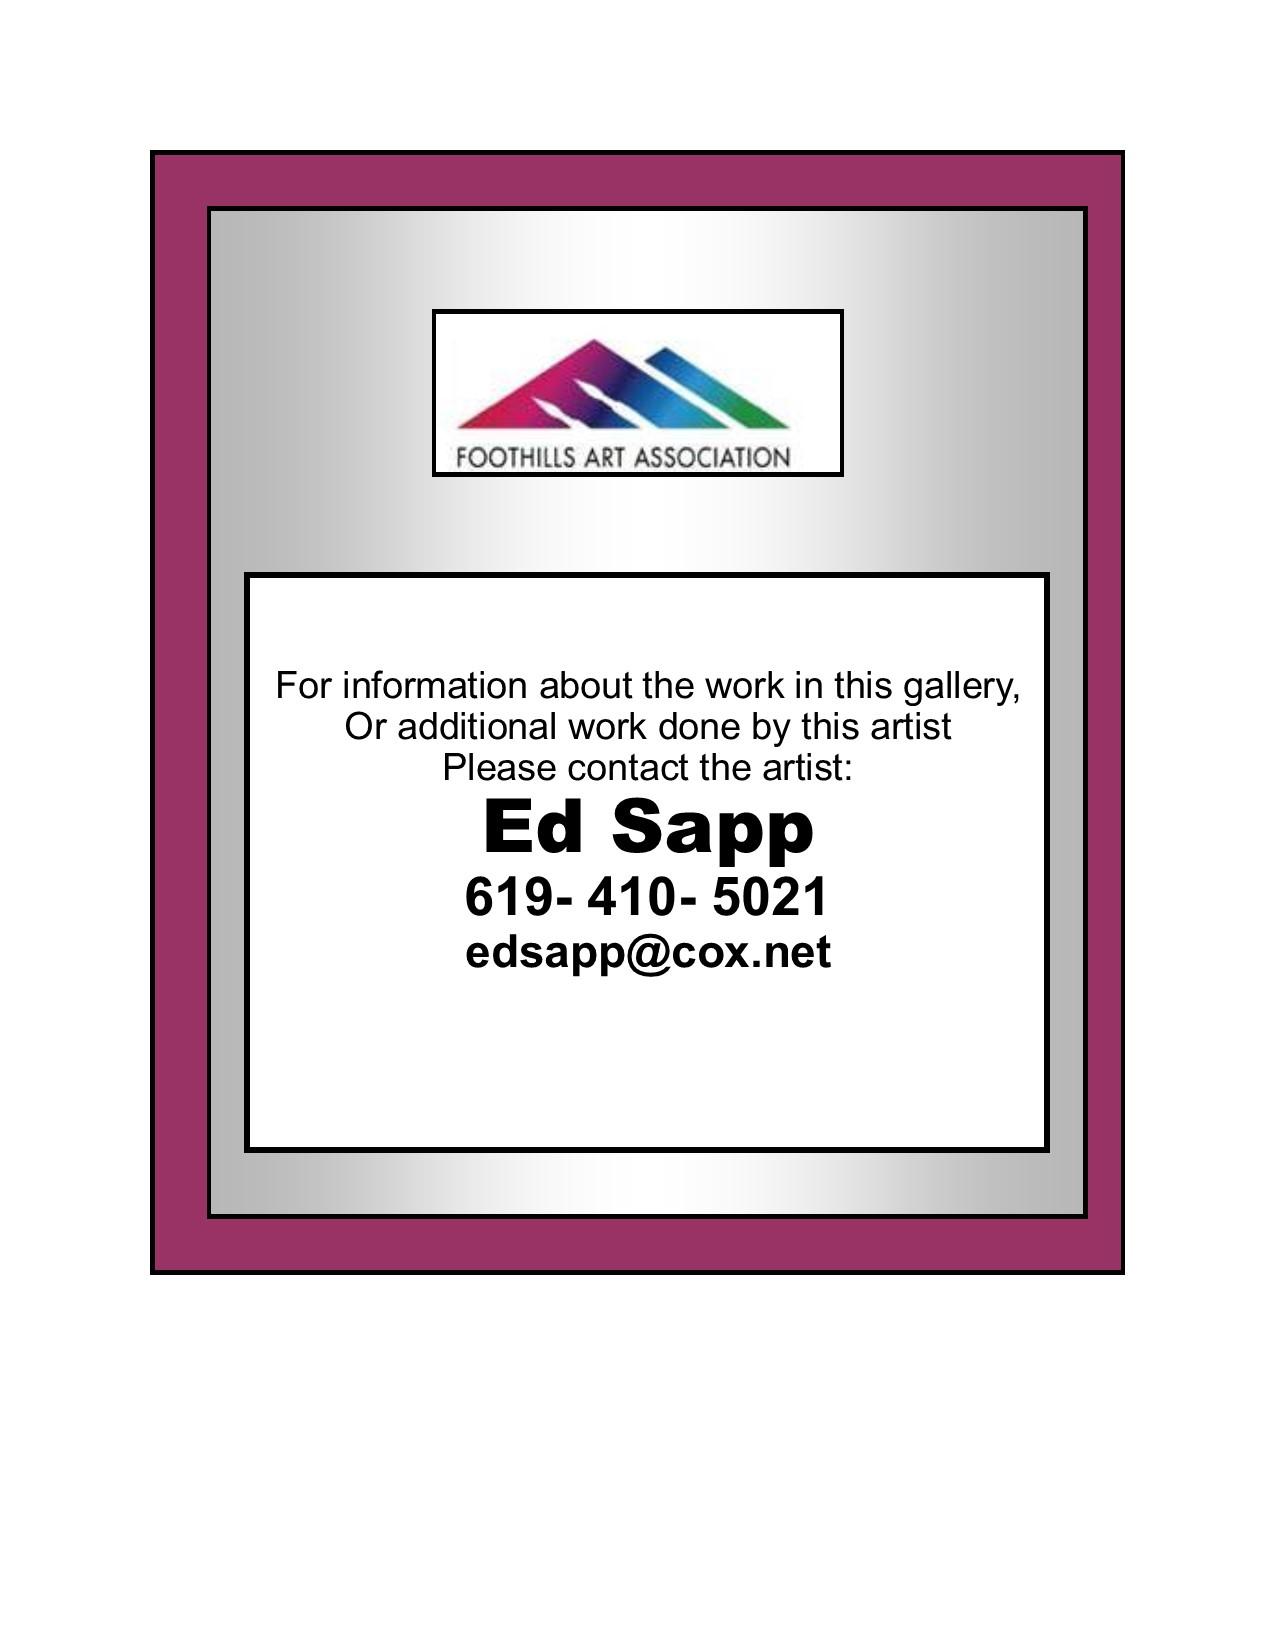 Sapp, Ed Contact